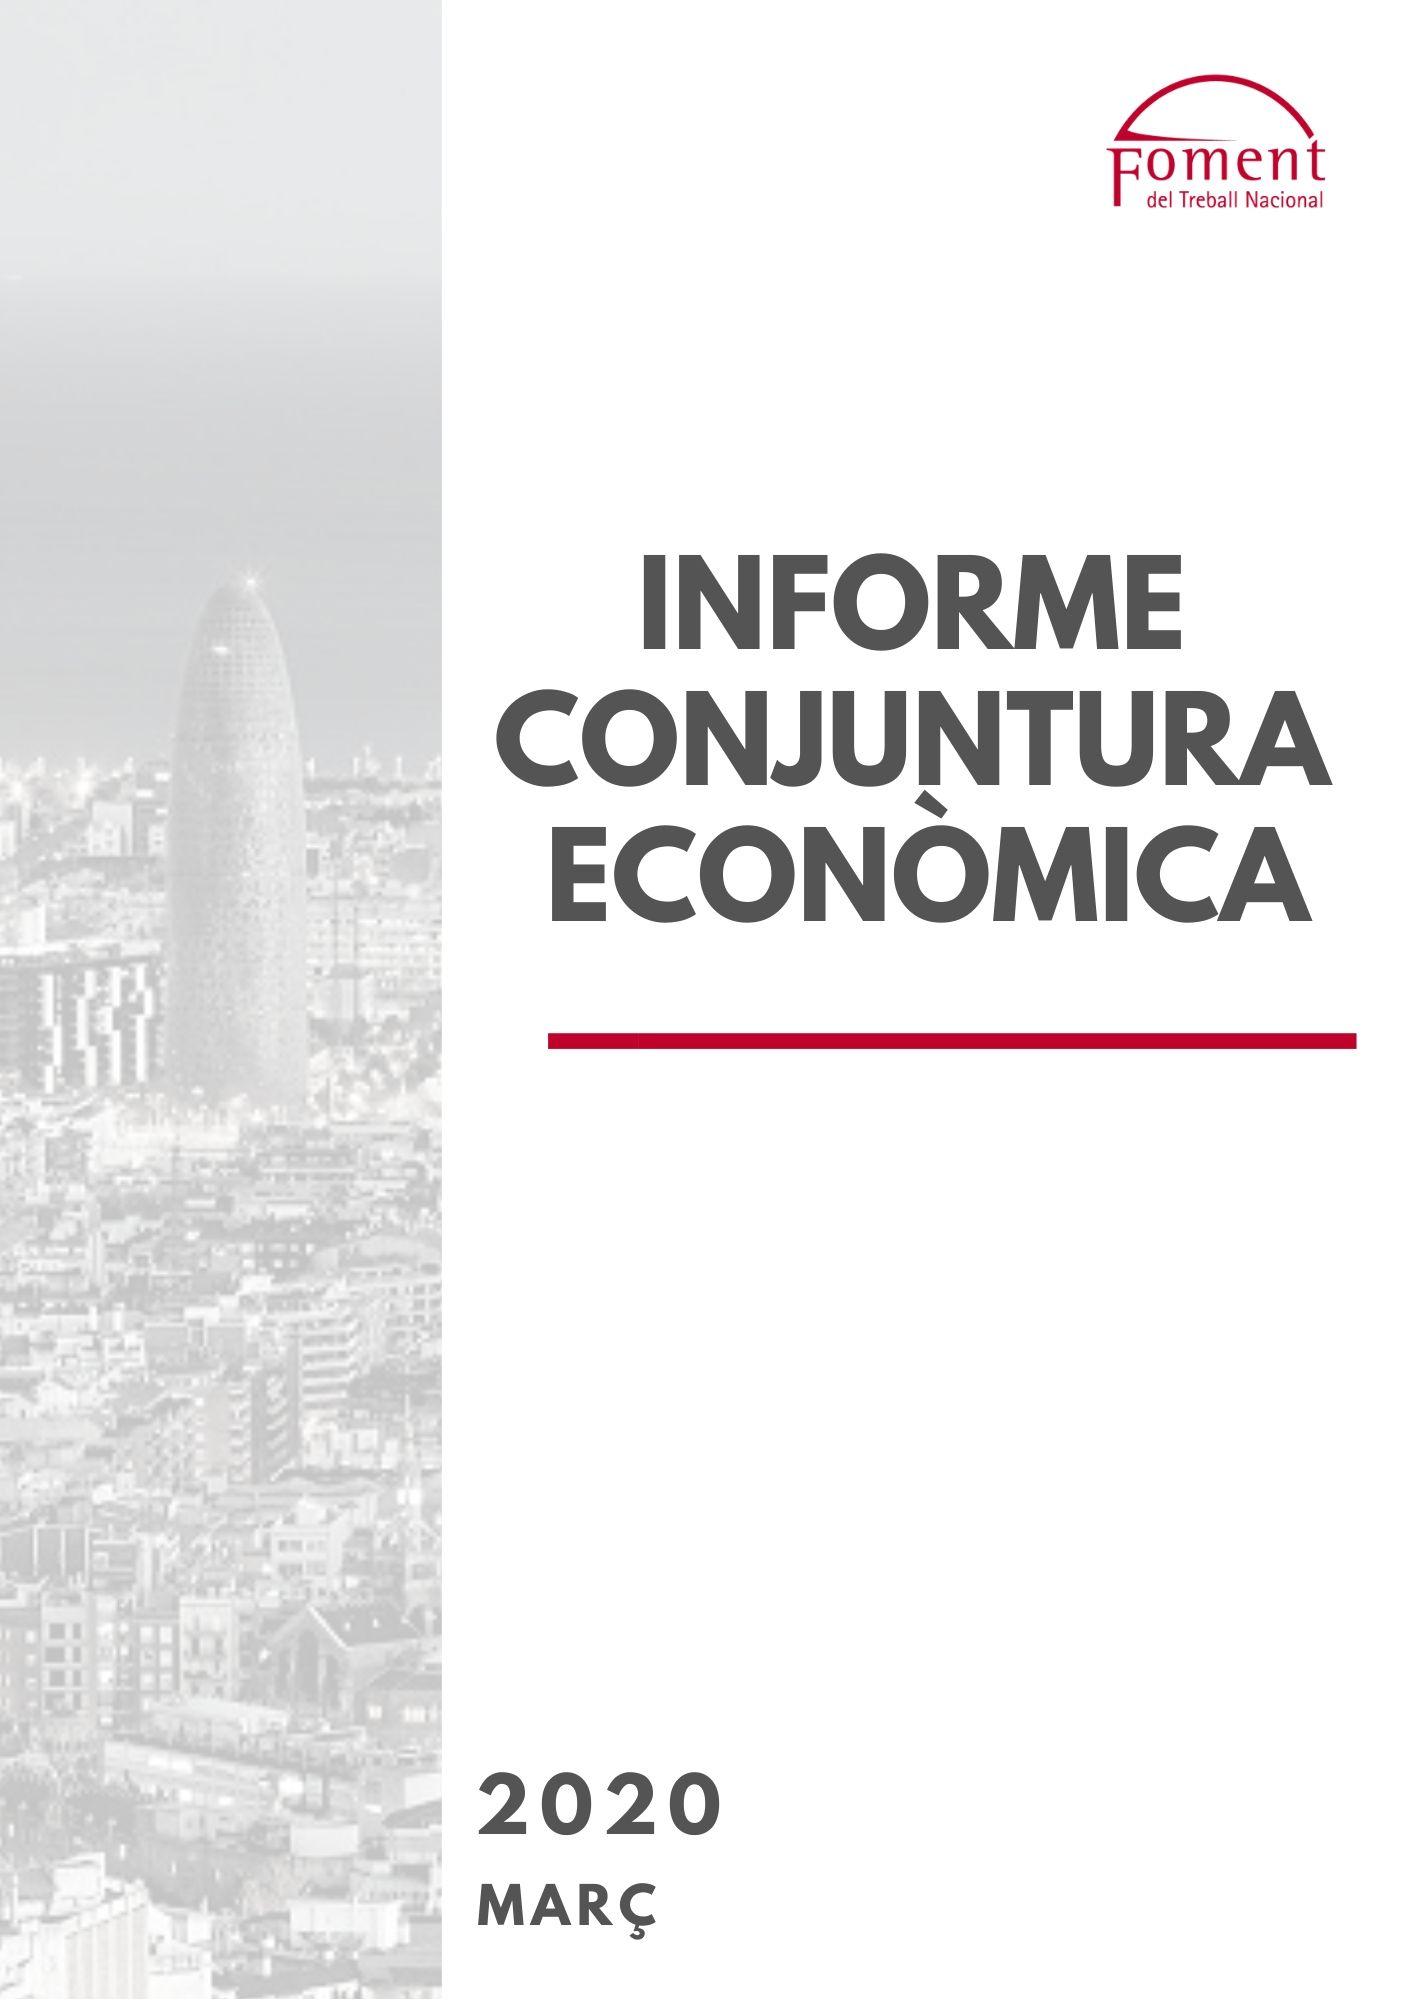 Informe de Conjuntura Econòmica – març 2020